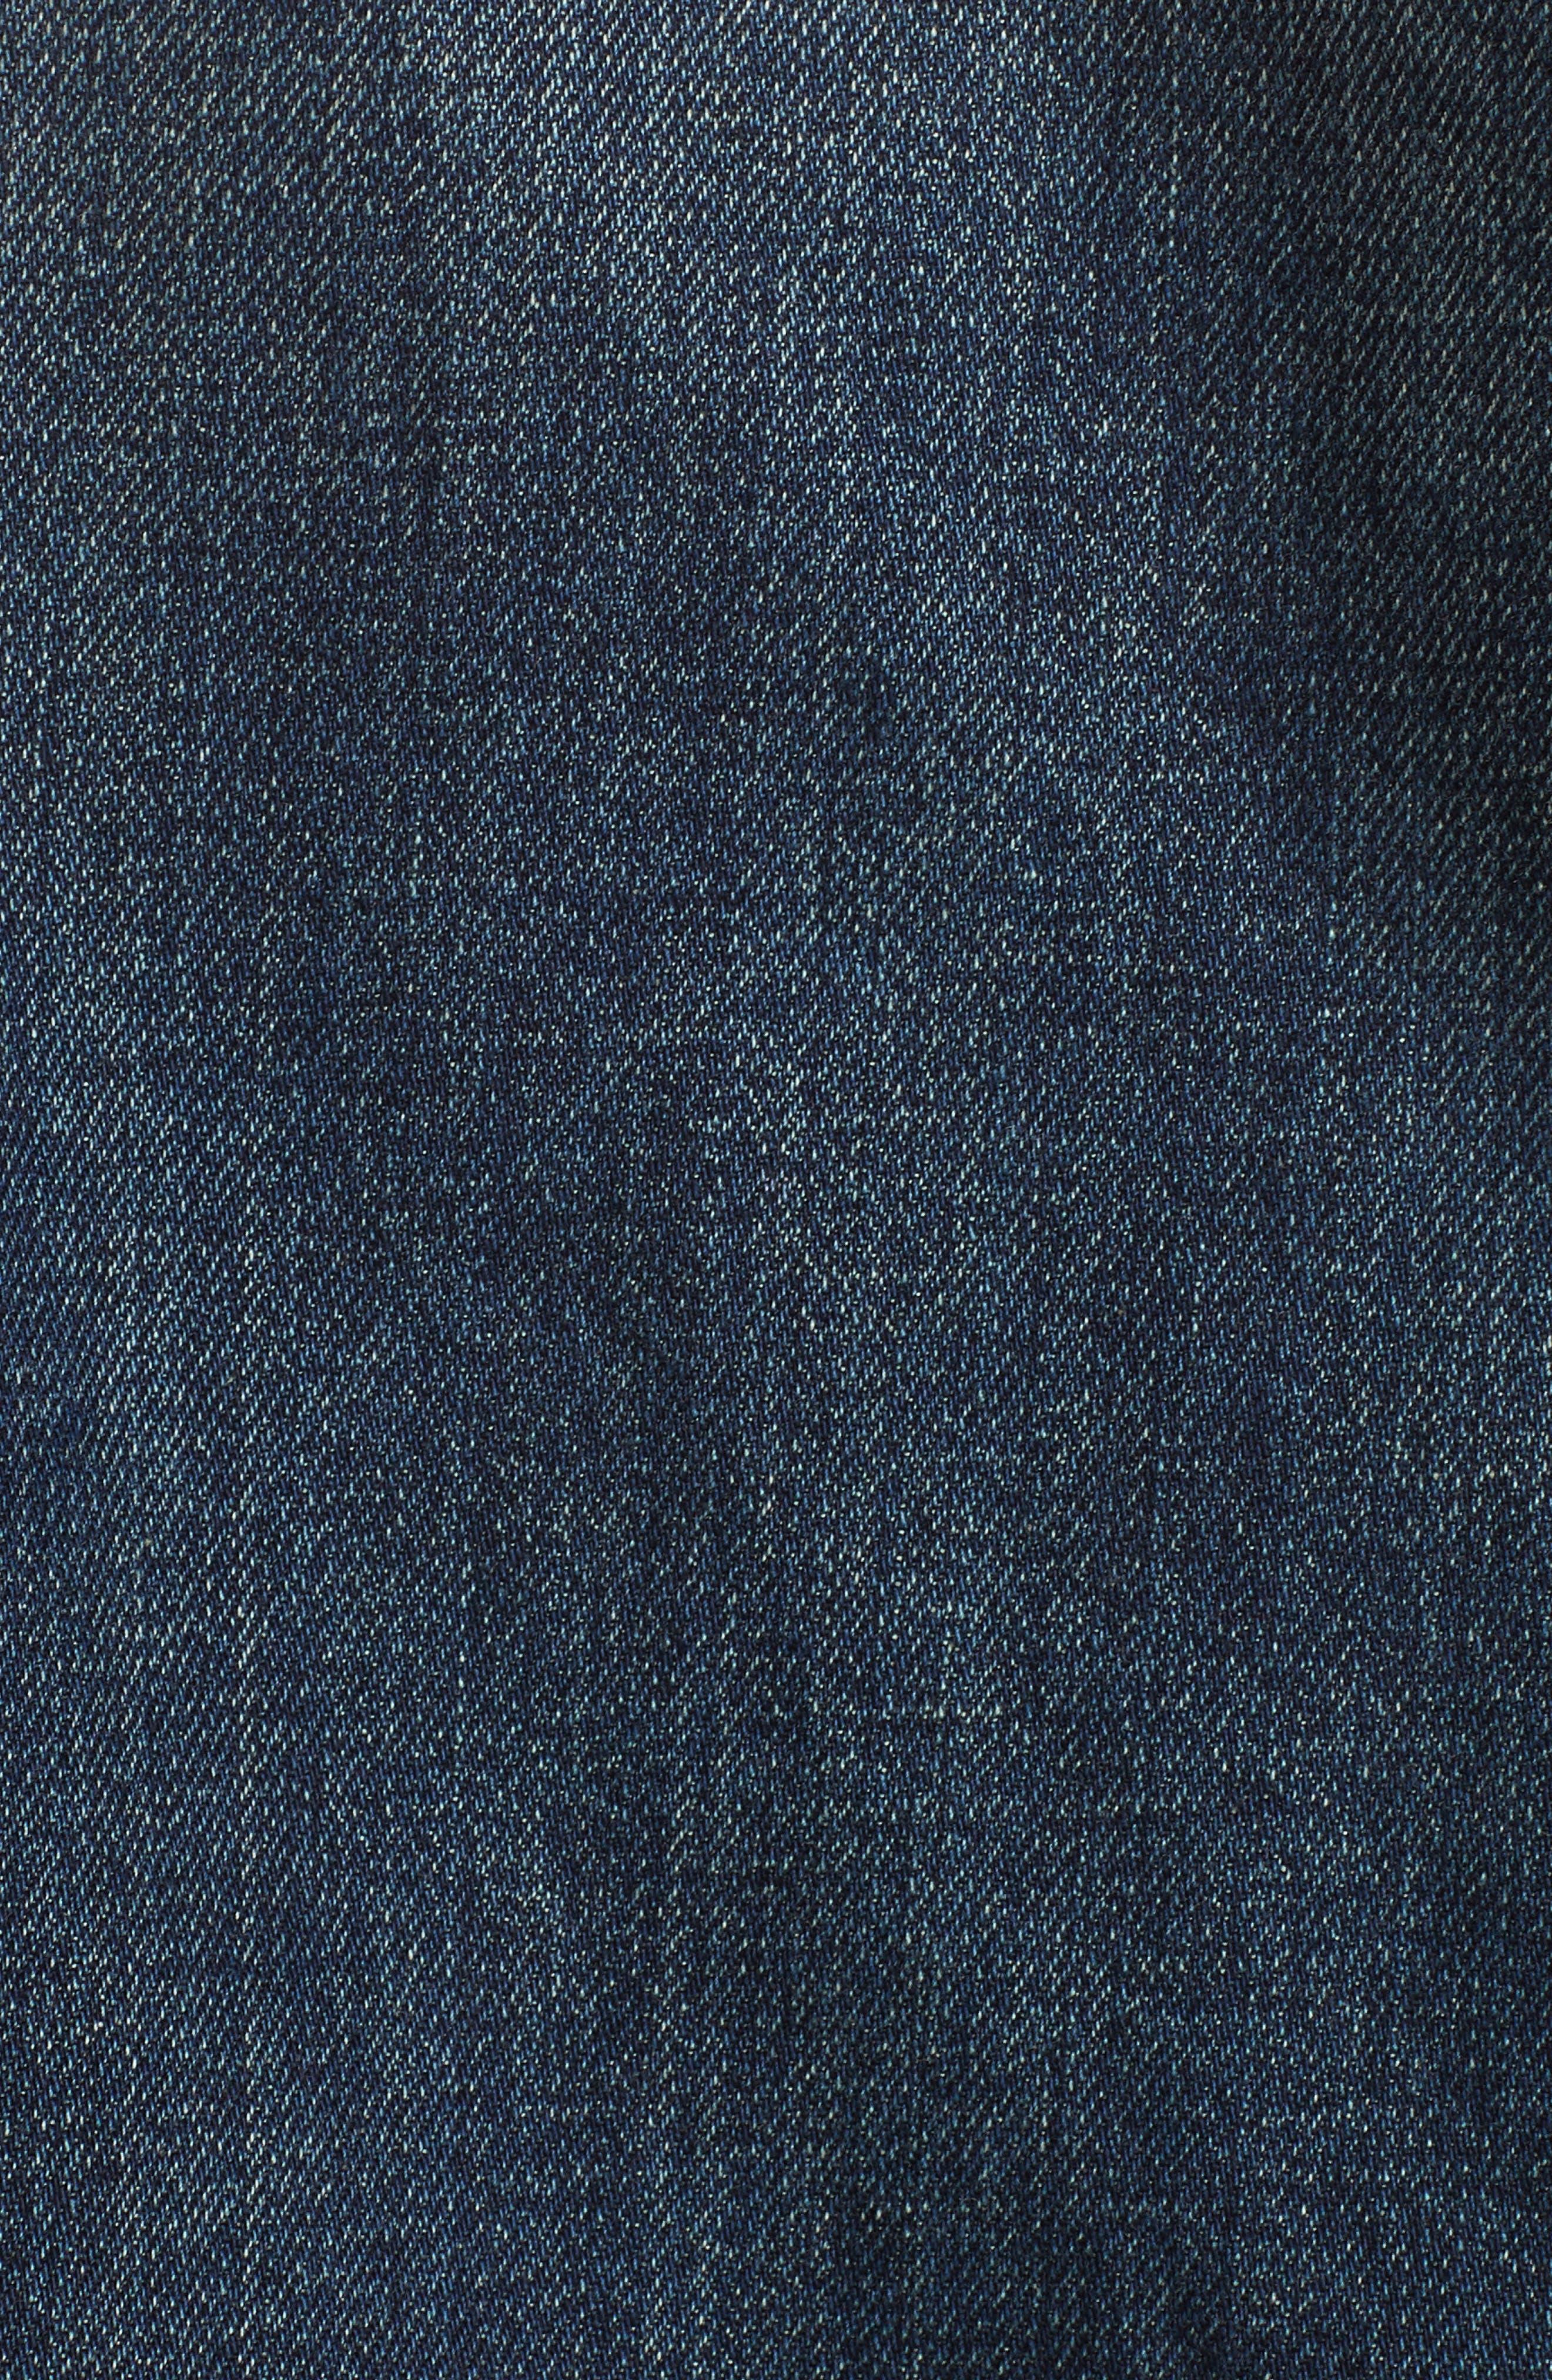 Denim Jacket,                             Alternate thumbnail 6, color,                             410